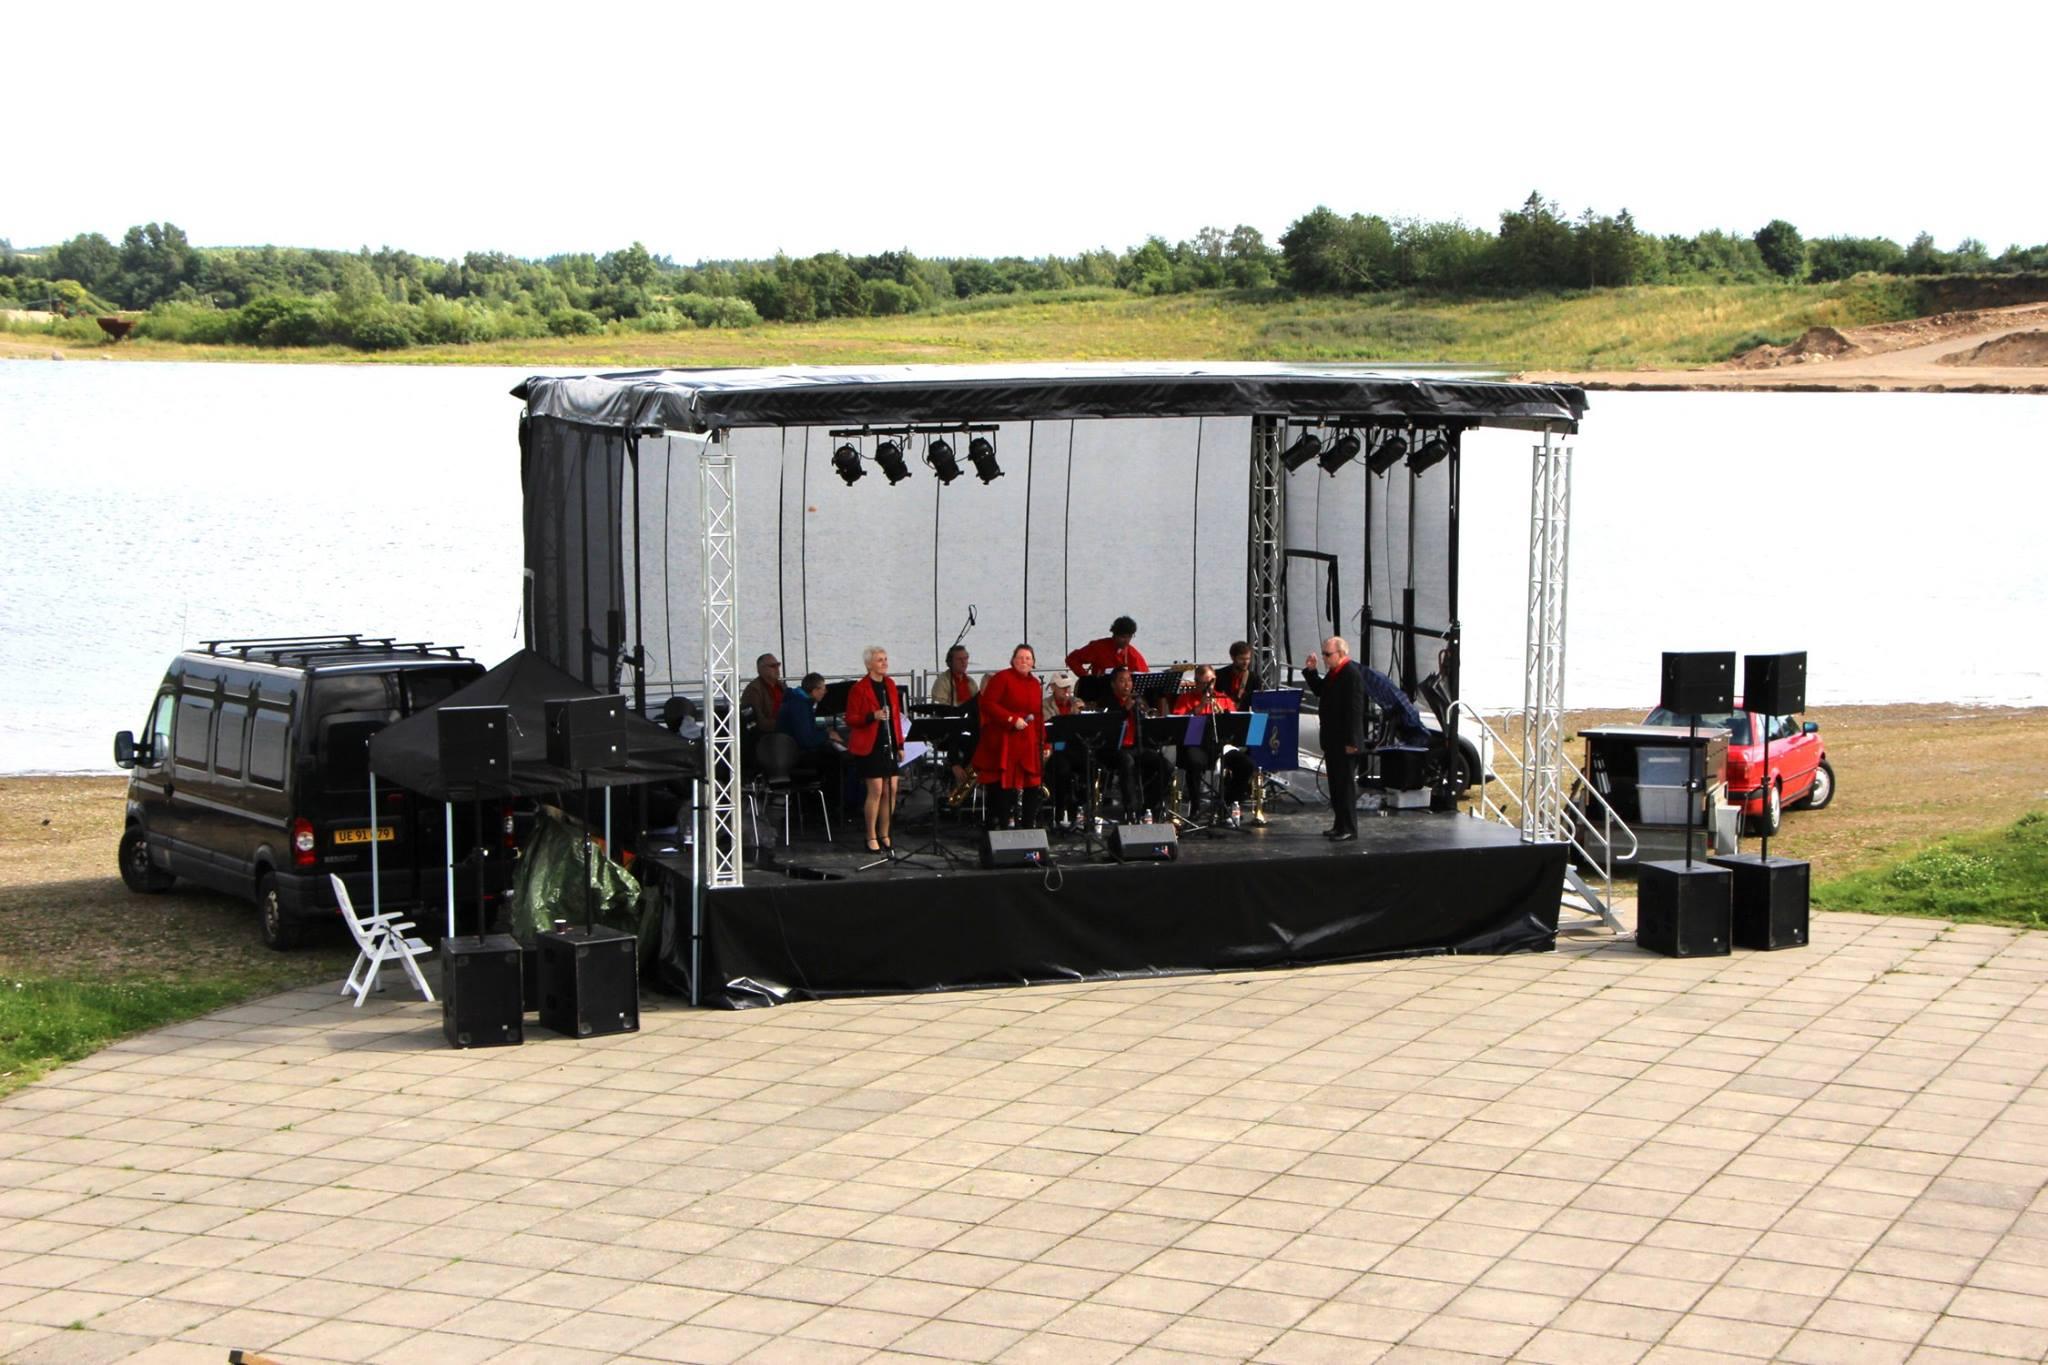 ÅRSBERETNING 2016 for Kulturforeningen Amfi Vestsjælland